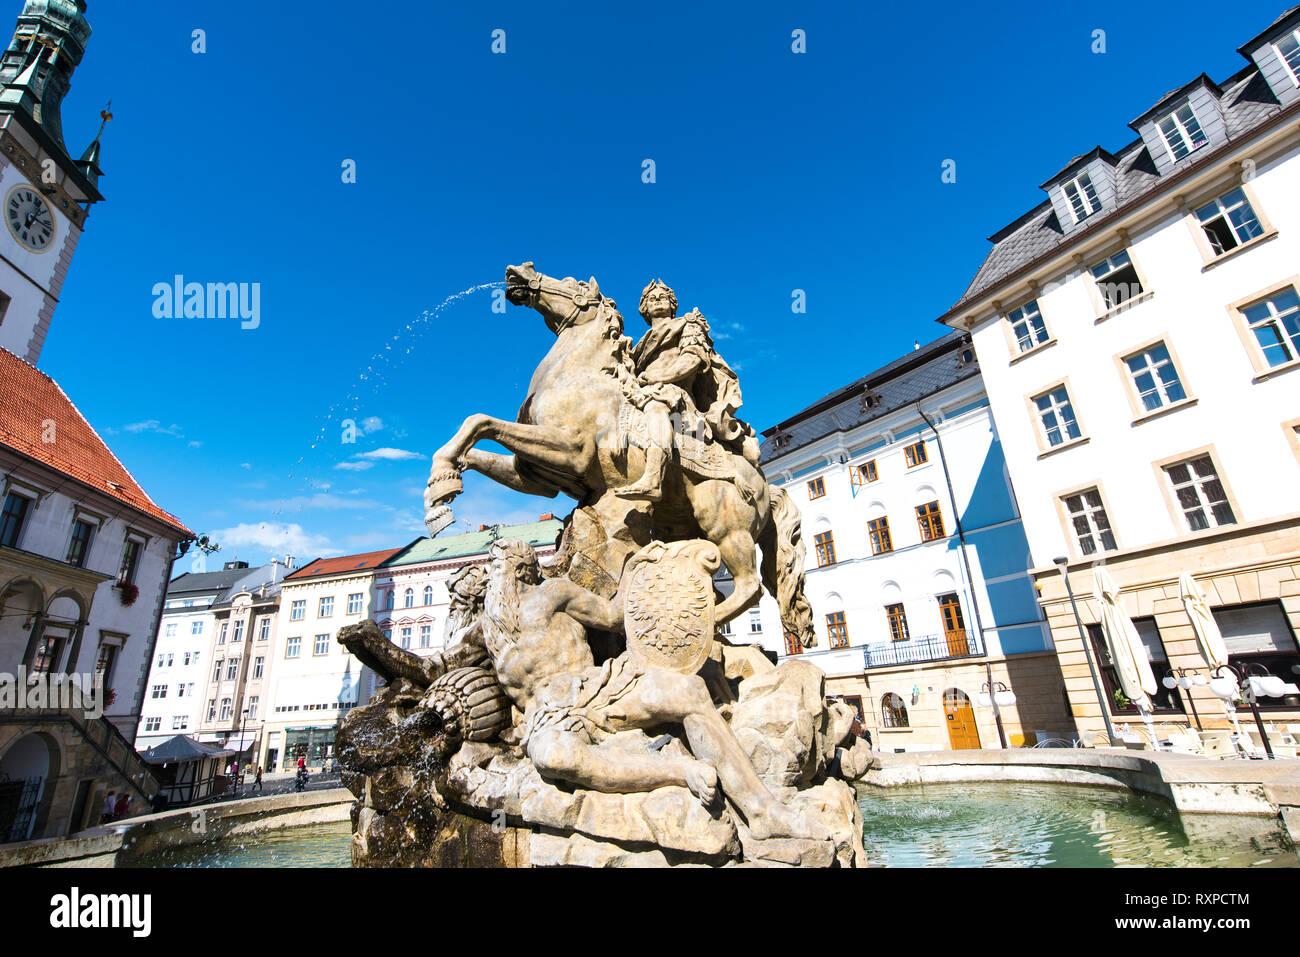 Caesar fountain against the blue sky in Olomouc. Czech Republic - Stock Image